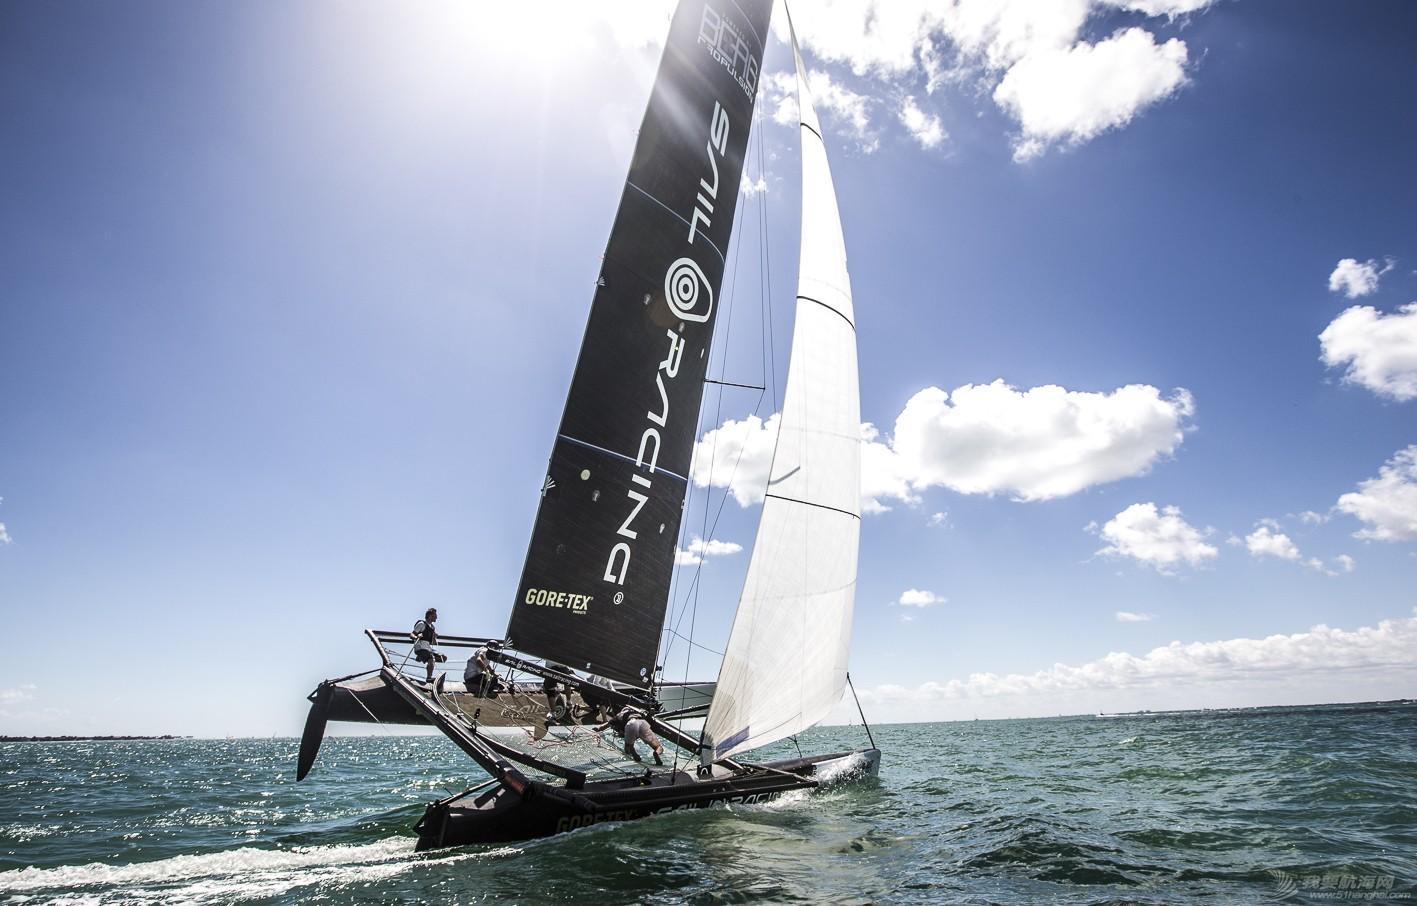 M32,极限赛,国际帆联 M32极限赛事即将加入国际帆船联合会赛事 BRA_4195.jpg